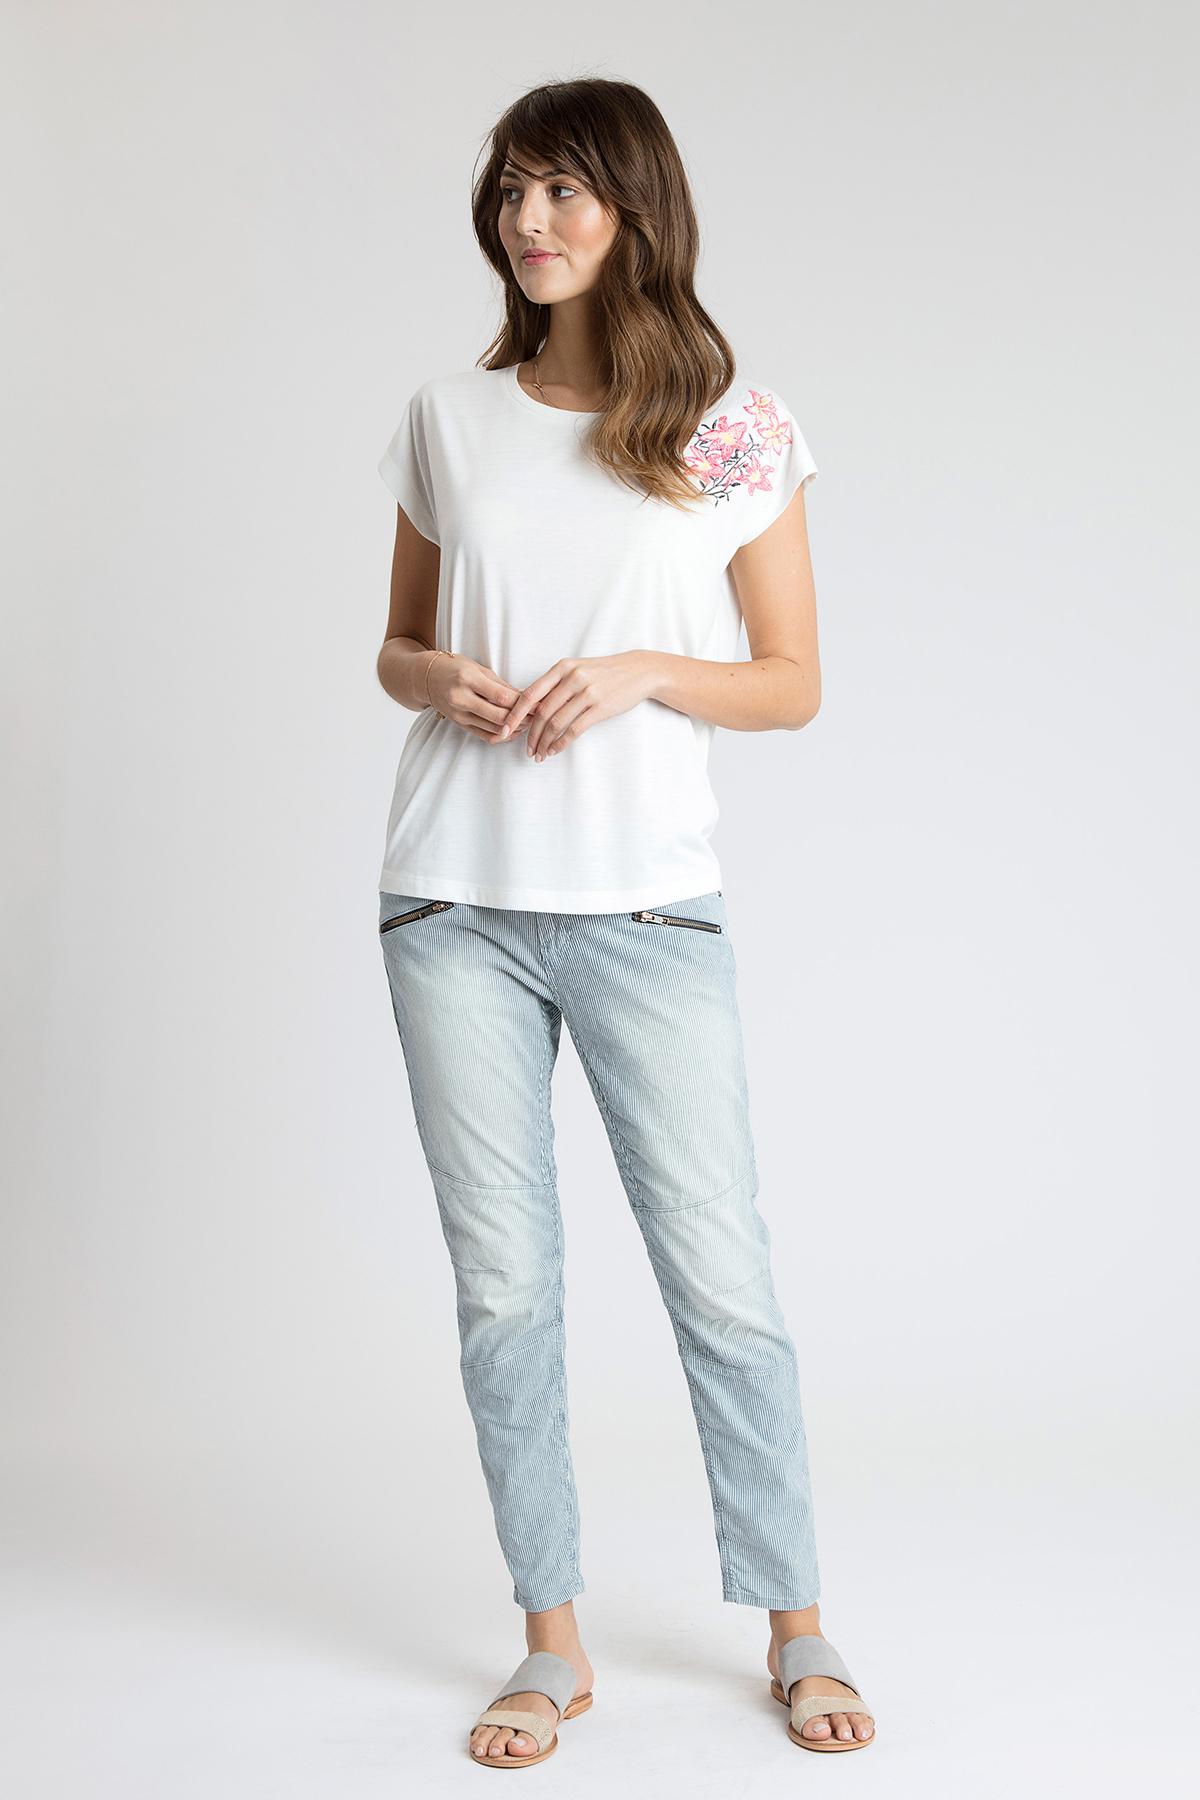 Wollweiß Kurzarm T-Shirt von Bon'A Parte – Shoppen Sie Wollweiß Kurzarm T-Shirt ab Gr. S-2XL hier